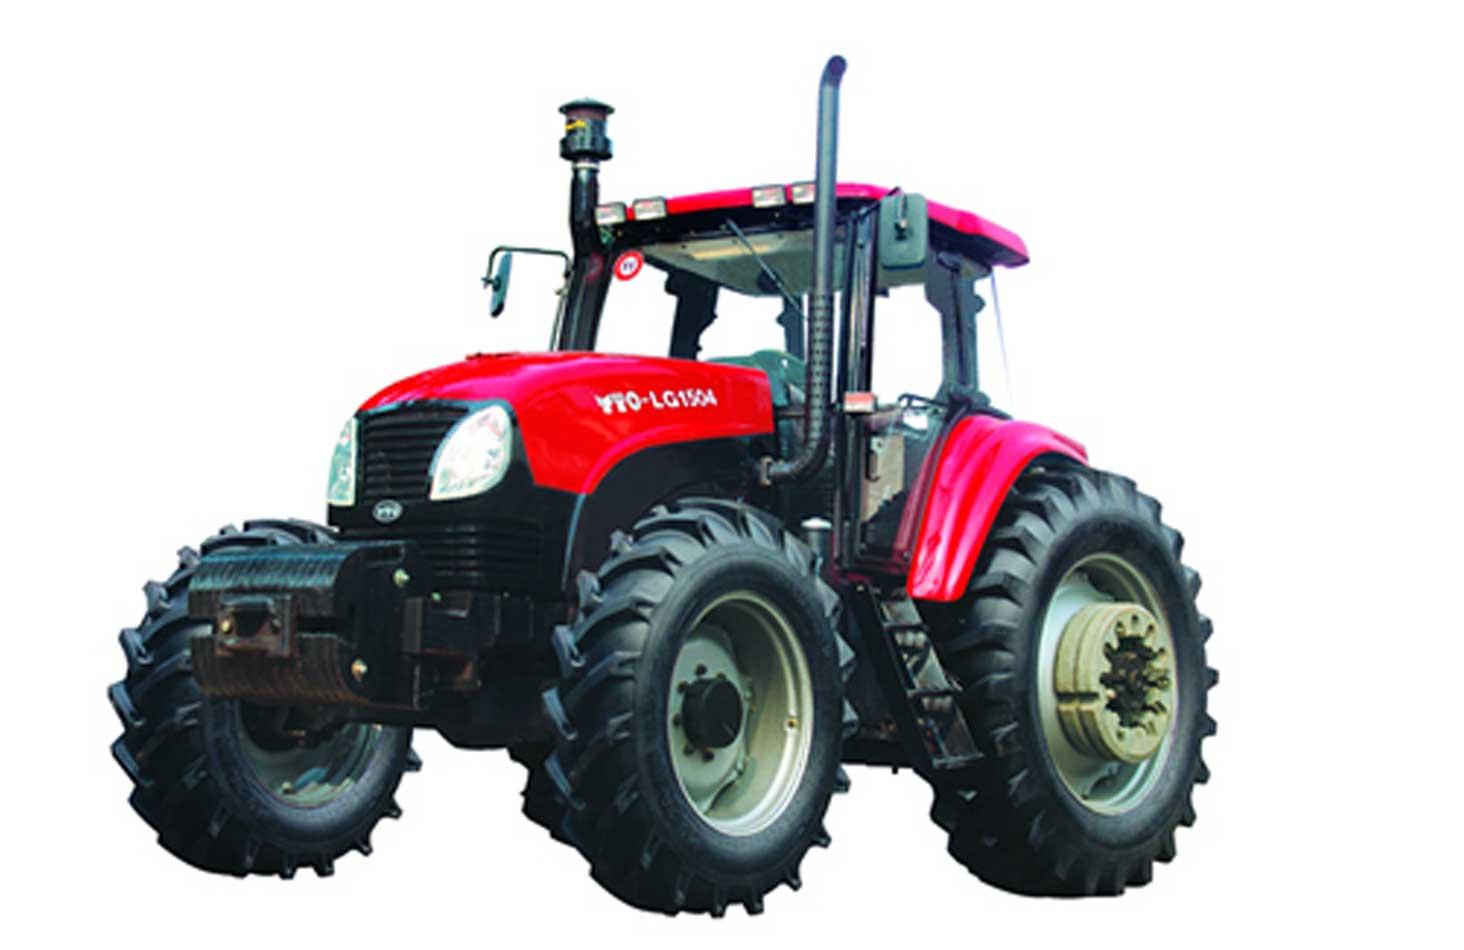 Тракторы моделей LX1304, LQ1404, LQ1504